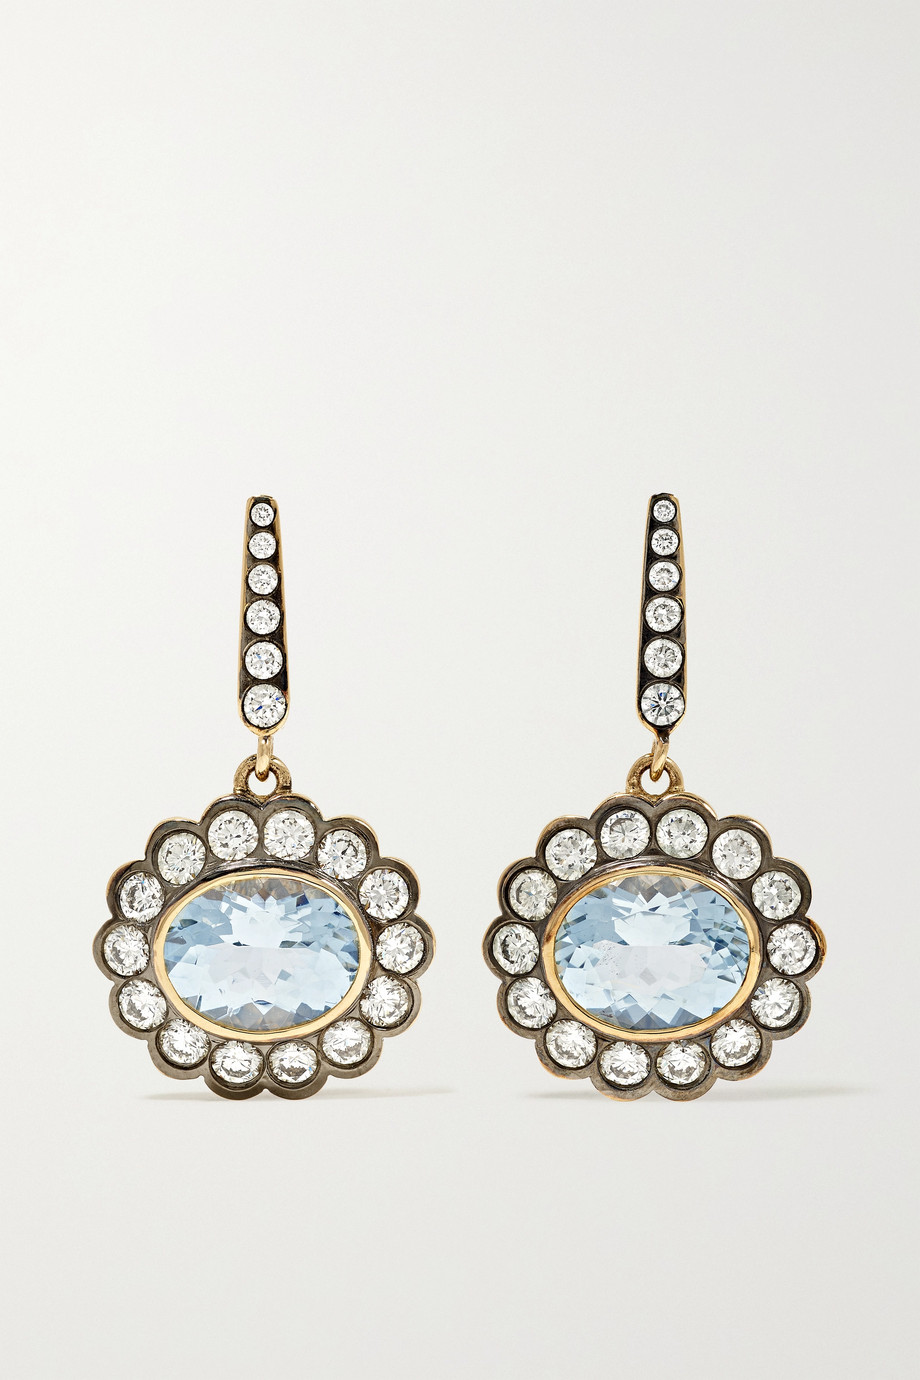 Marlo Laz Alexandra 14-karat gold, diamond and aquamarine earrings